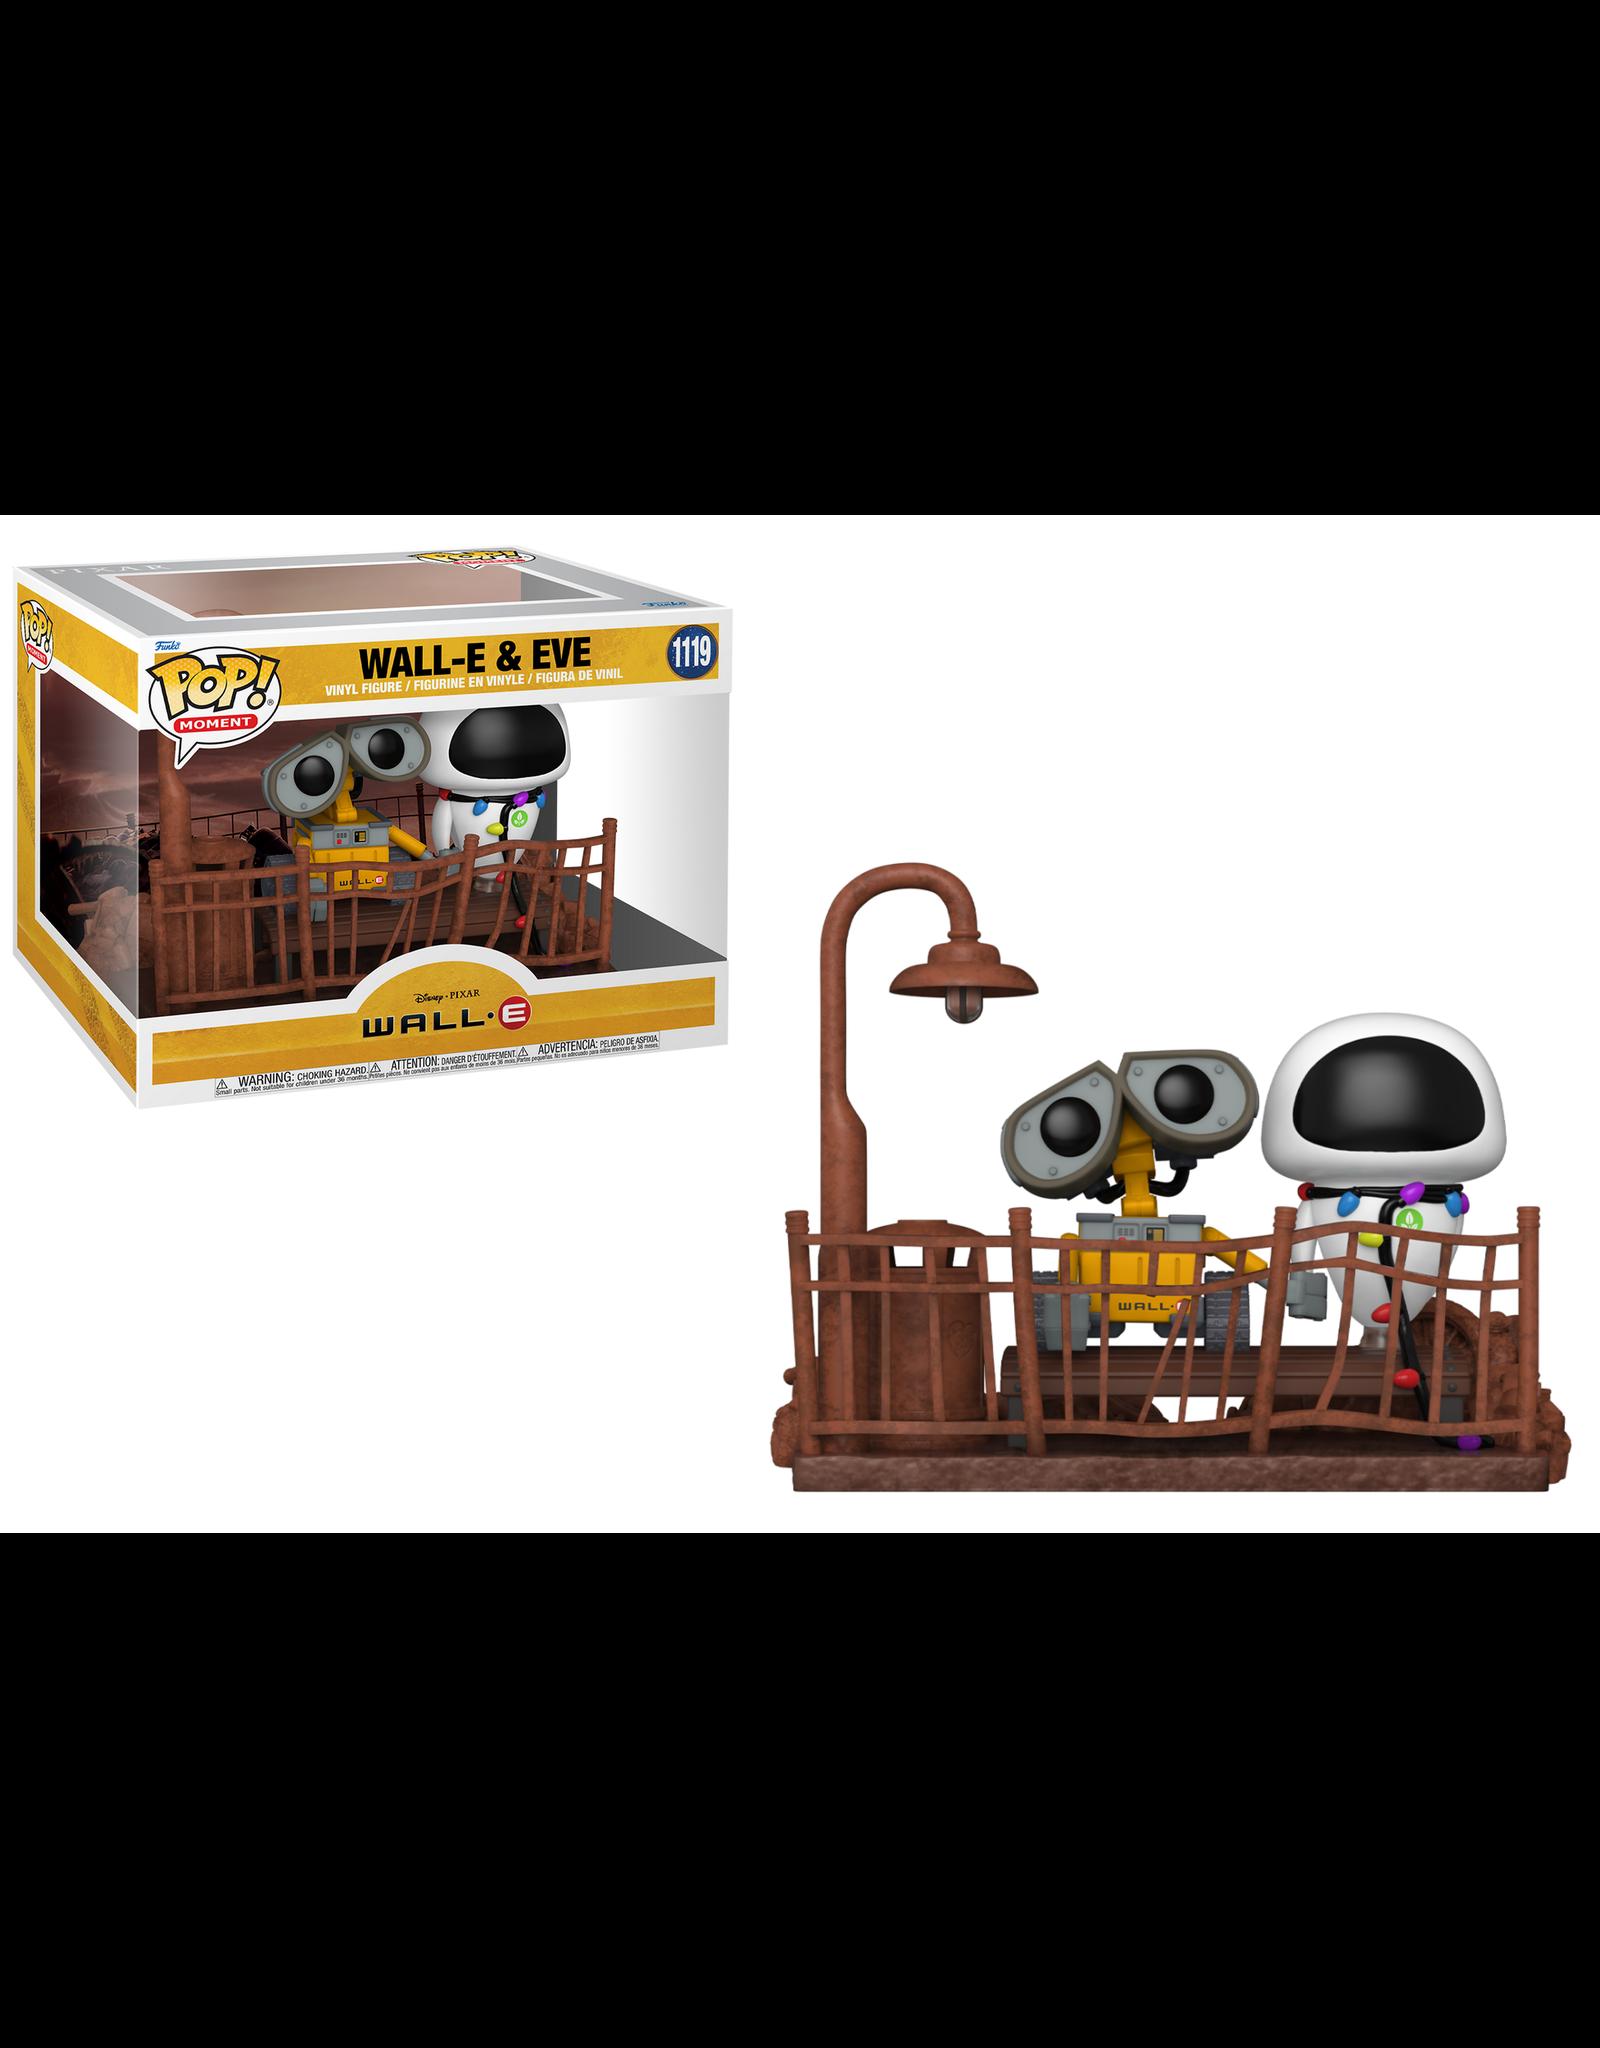 Funko WALL-E POP! Moment N°1119 - 2-Pack Wall-E & Eve